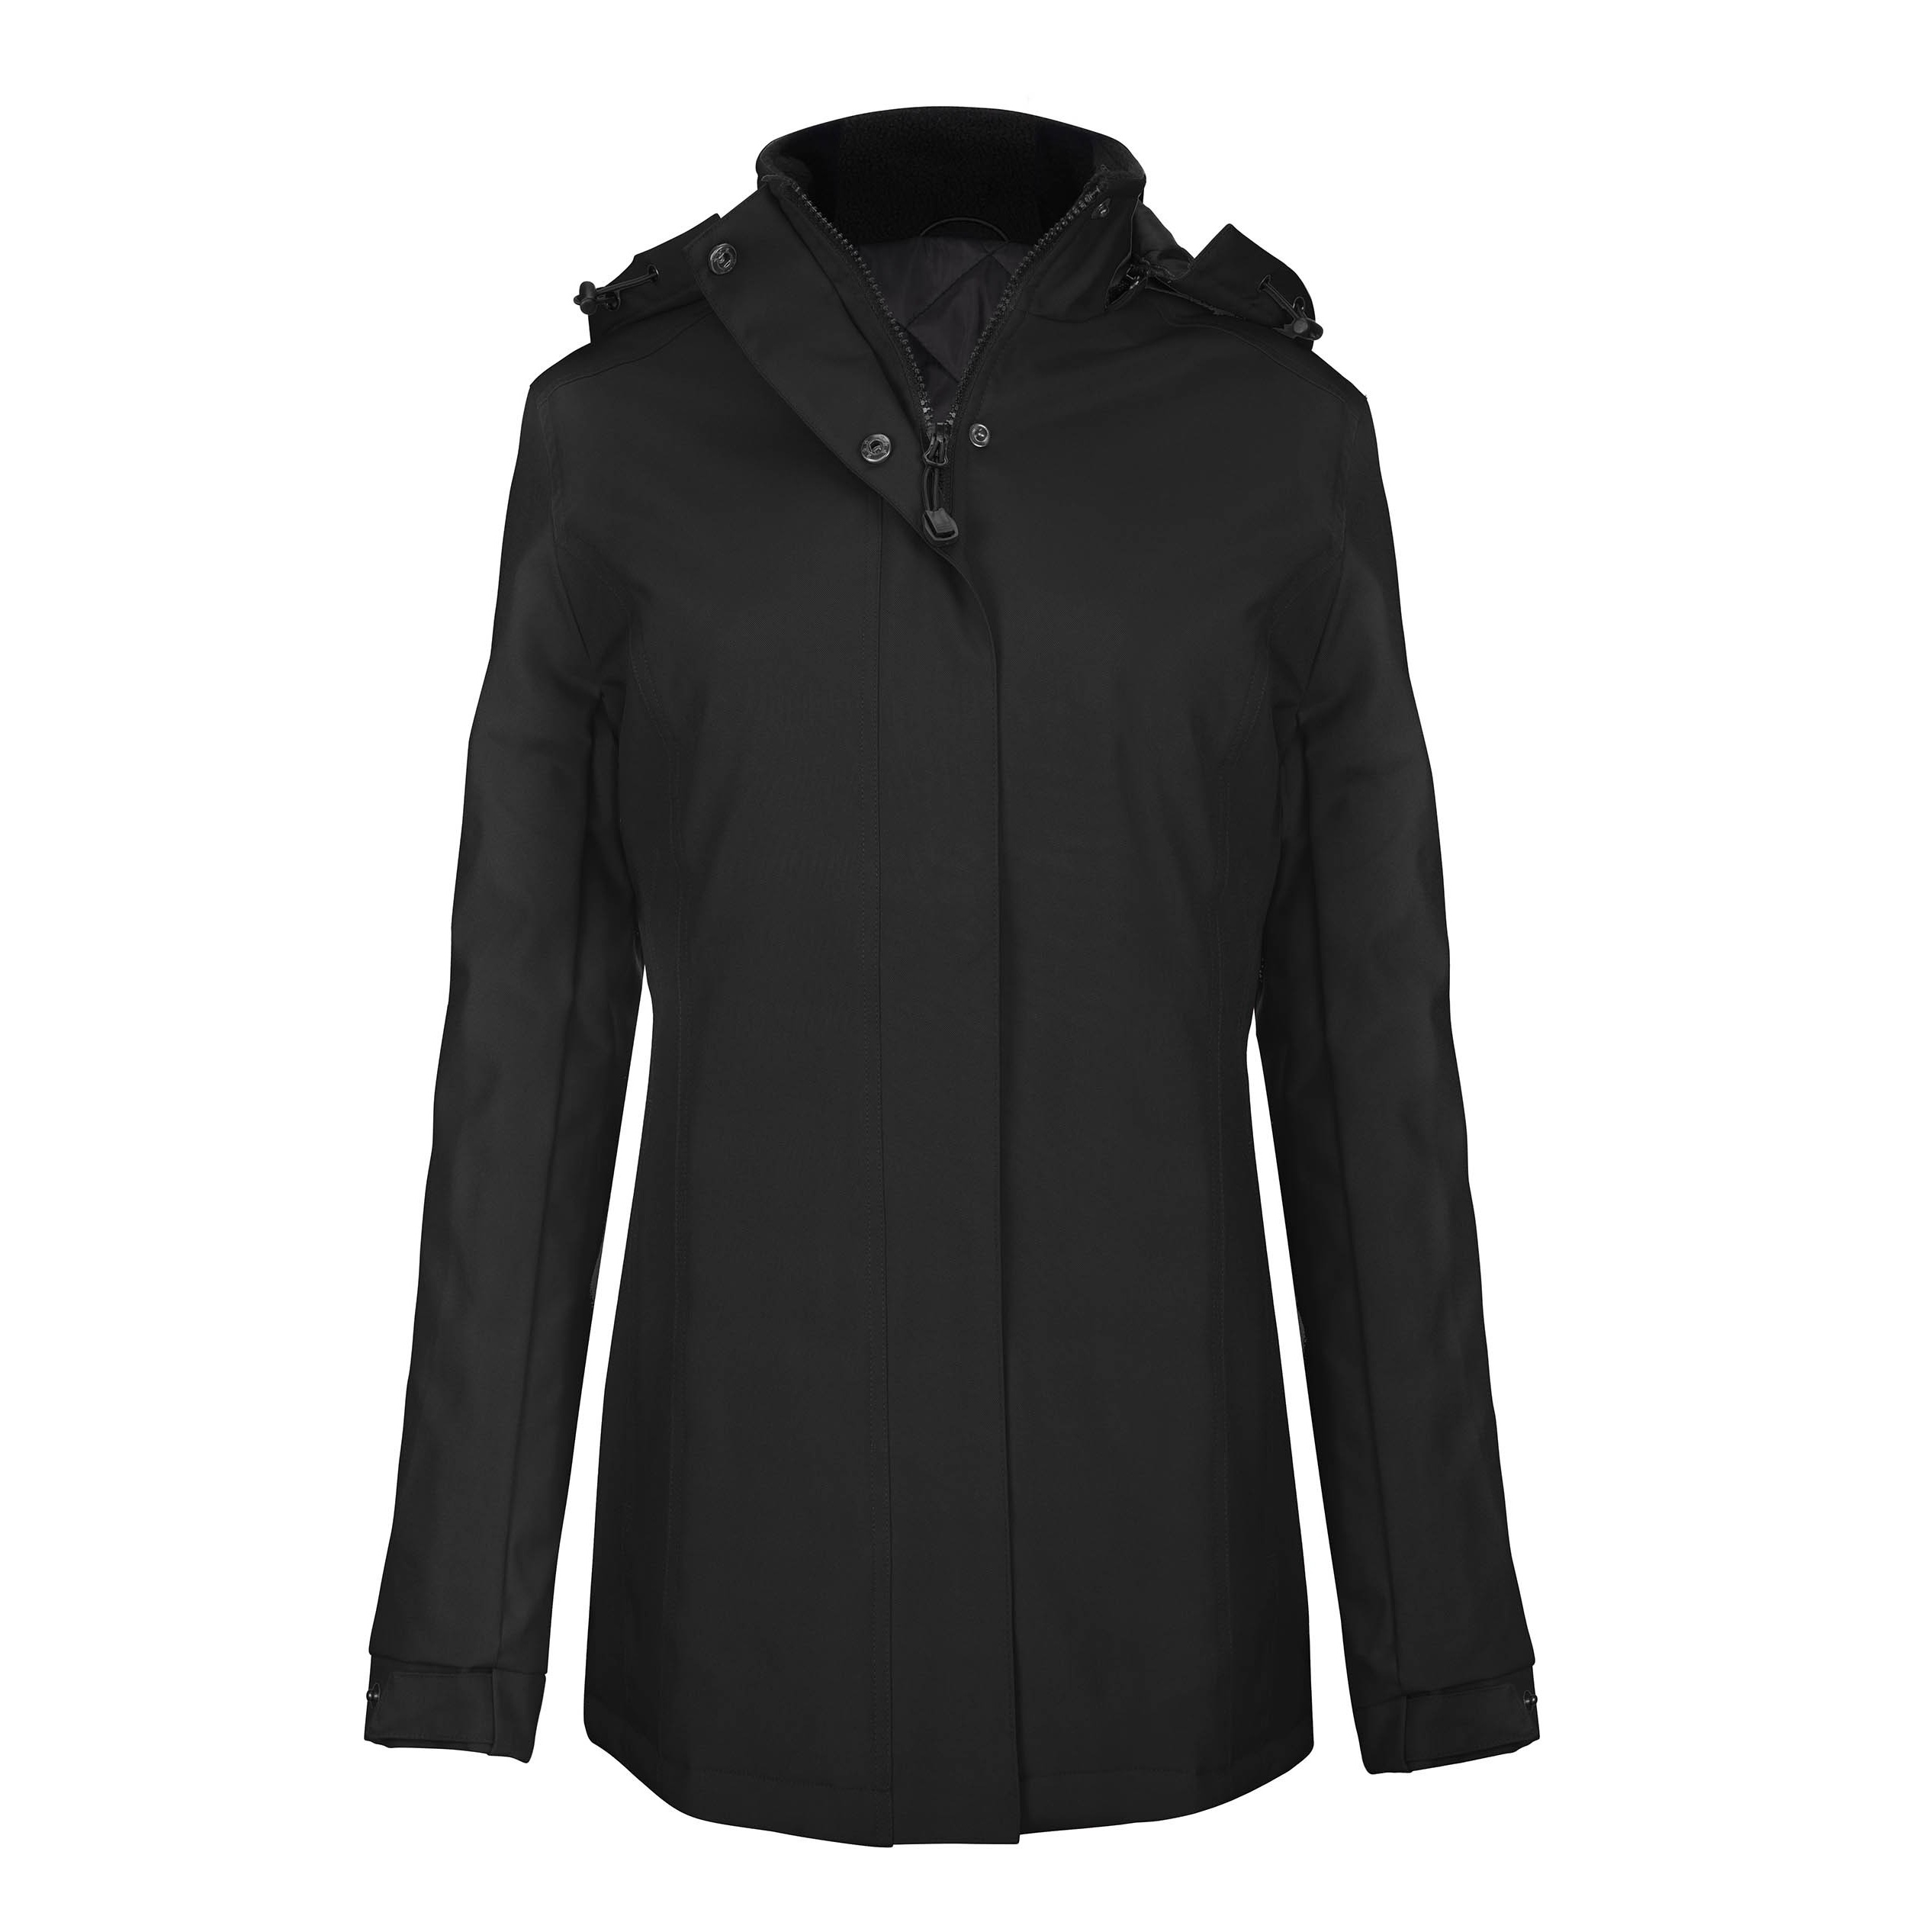 Kariban Womens/Ladies Hooded Parka Jacket (XL) (Black)